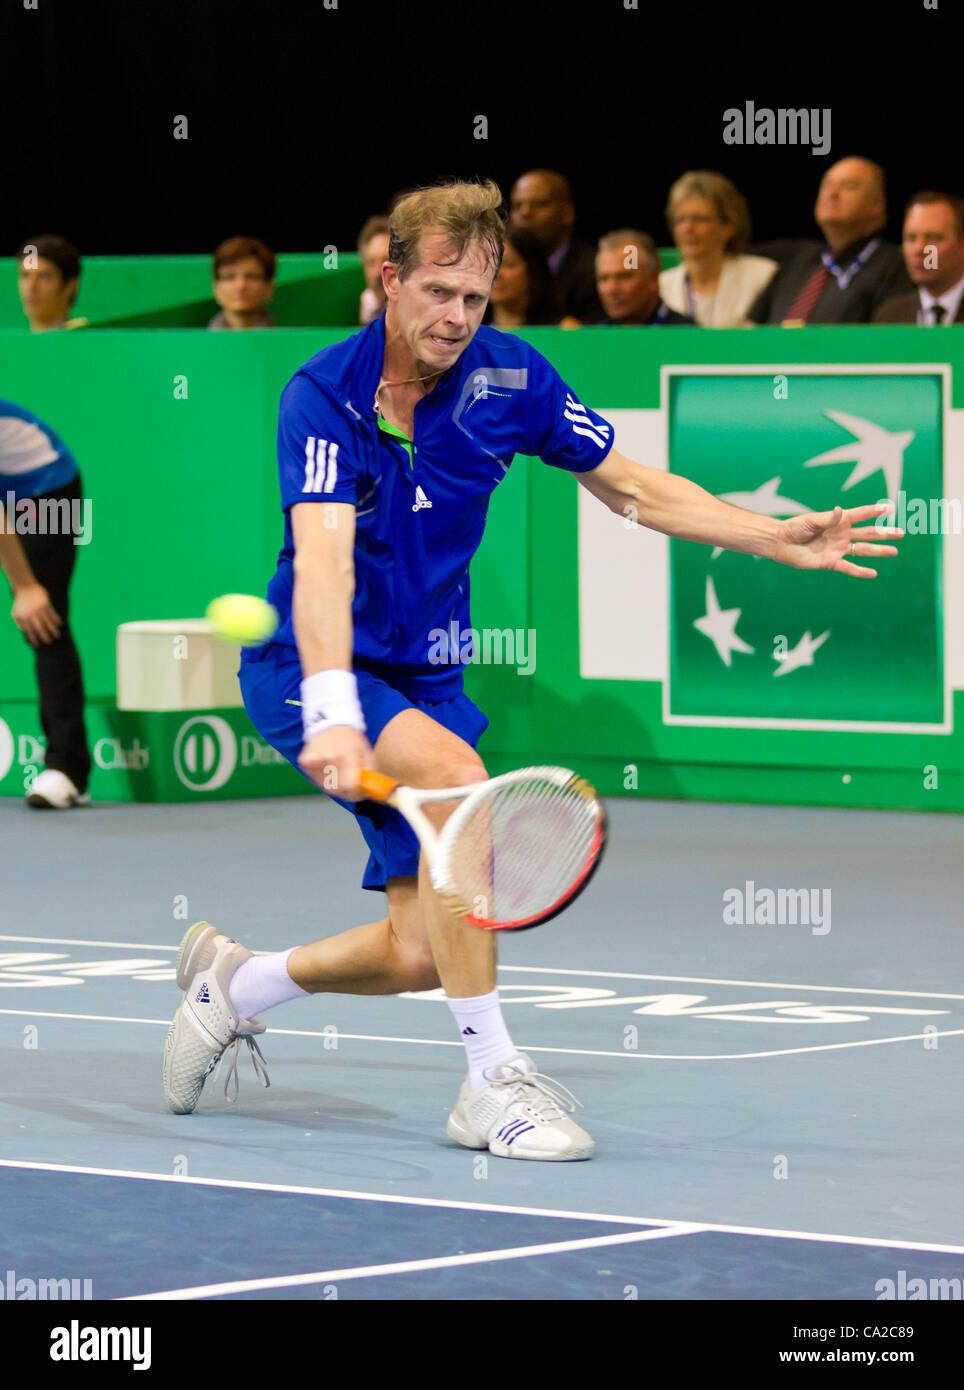 ZURICH, SWITZERLAND-MARCH 24: Stefan Edberg plays tennis in final of BNP Paribas Open Champions Tour aganinst Carlos - Stock Image